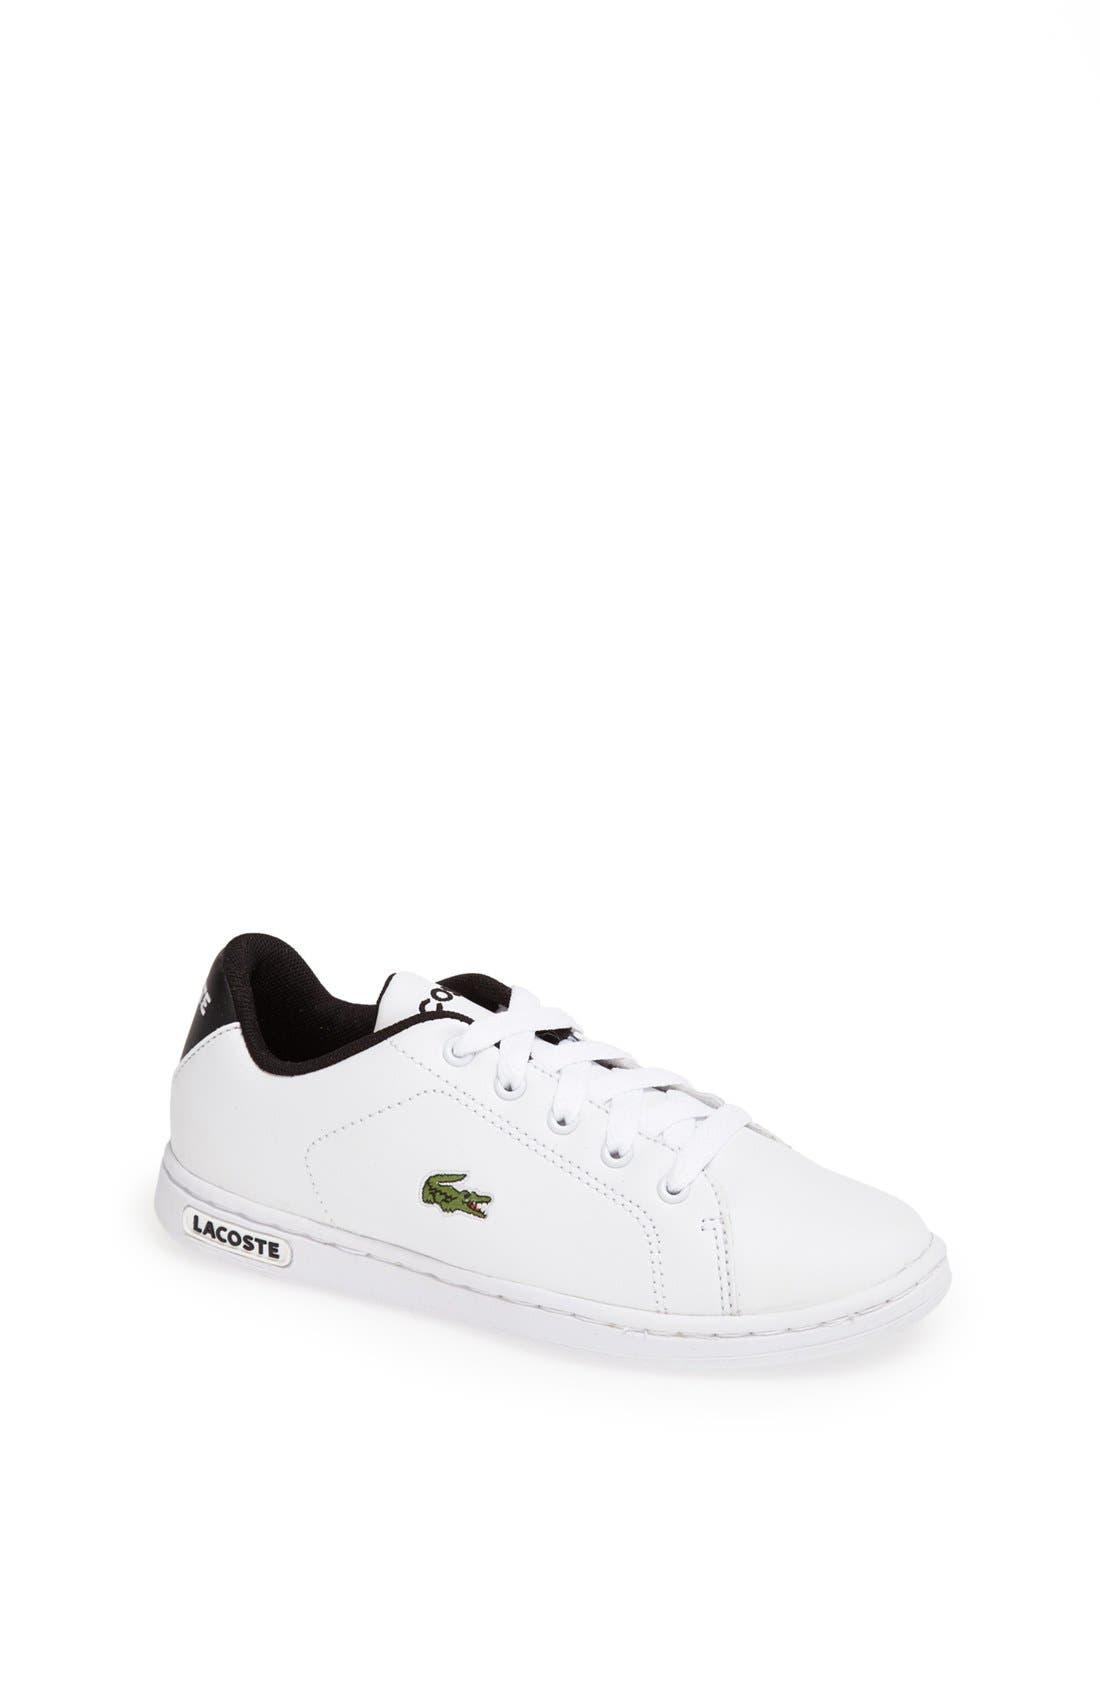 Main Image - Lacoste 'Carnaby' Sneaker (Baby, Walker, Toddler, Little Kid & Big Kid)